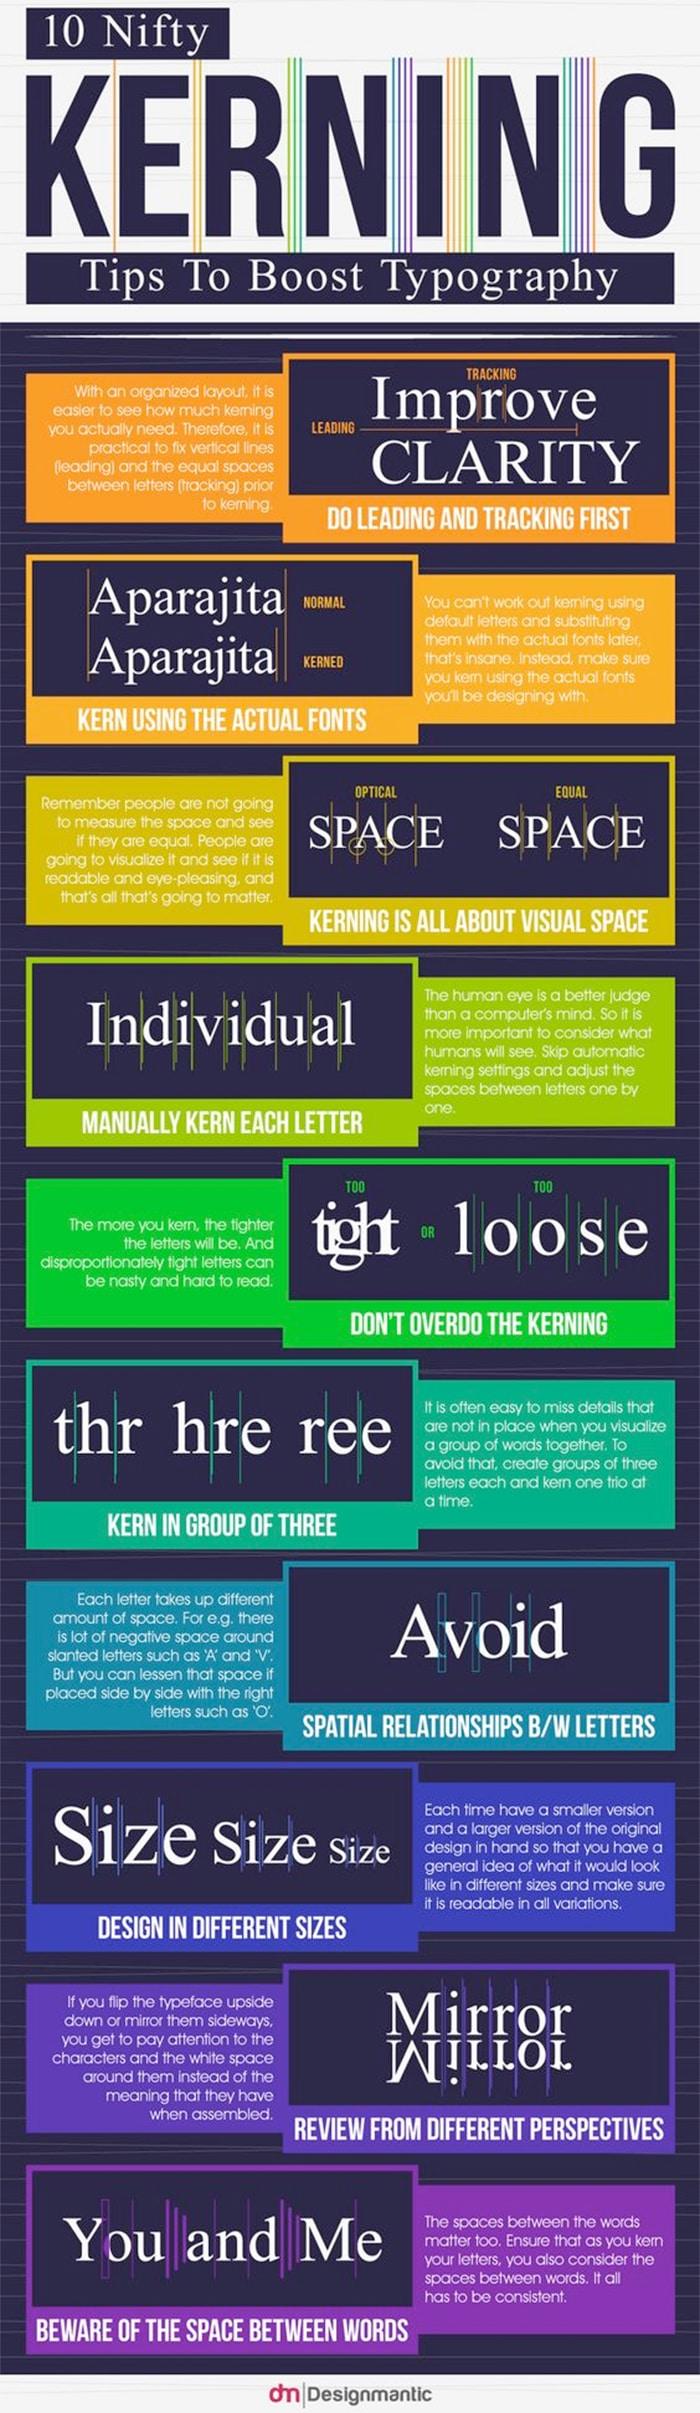 kerning tips infographic